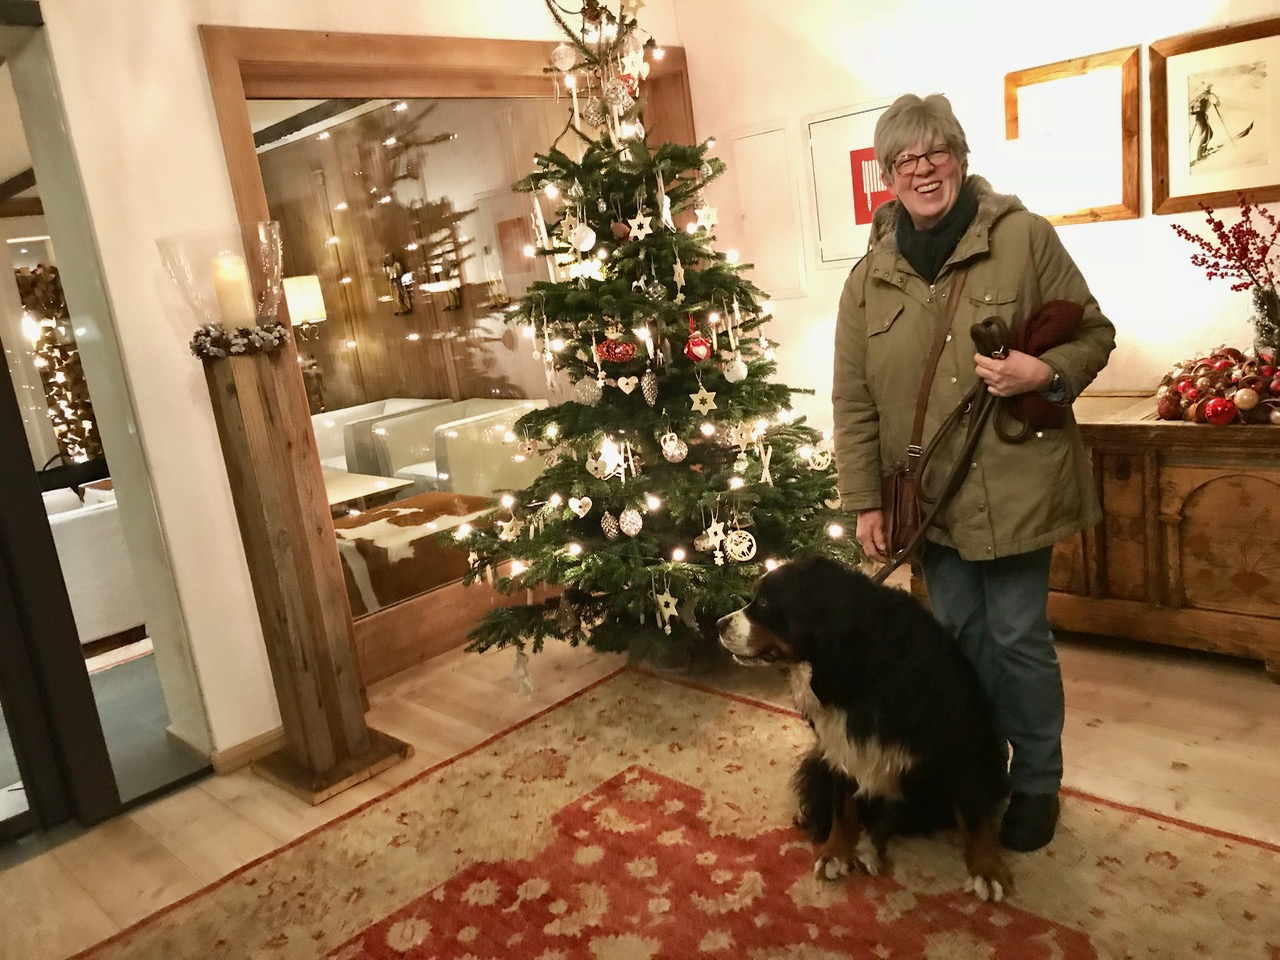 Frohe Weihnachten! – Dr. Beate Forsbach